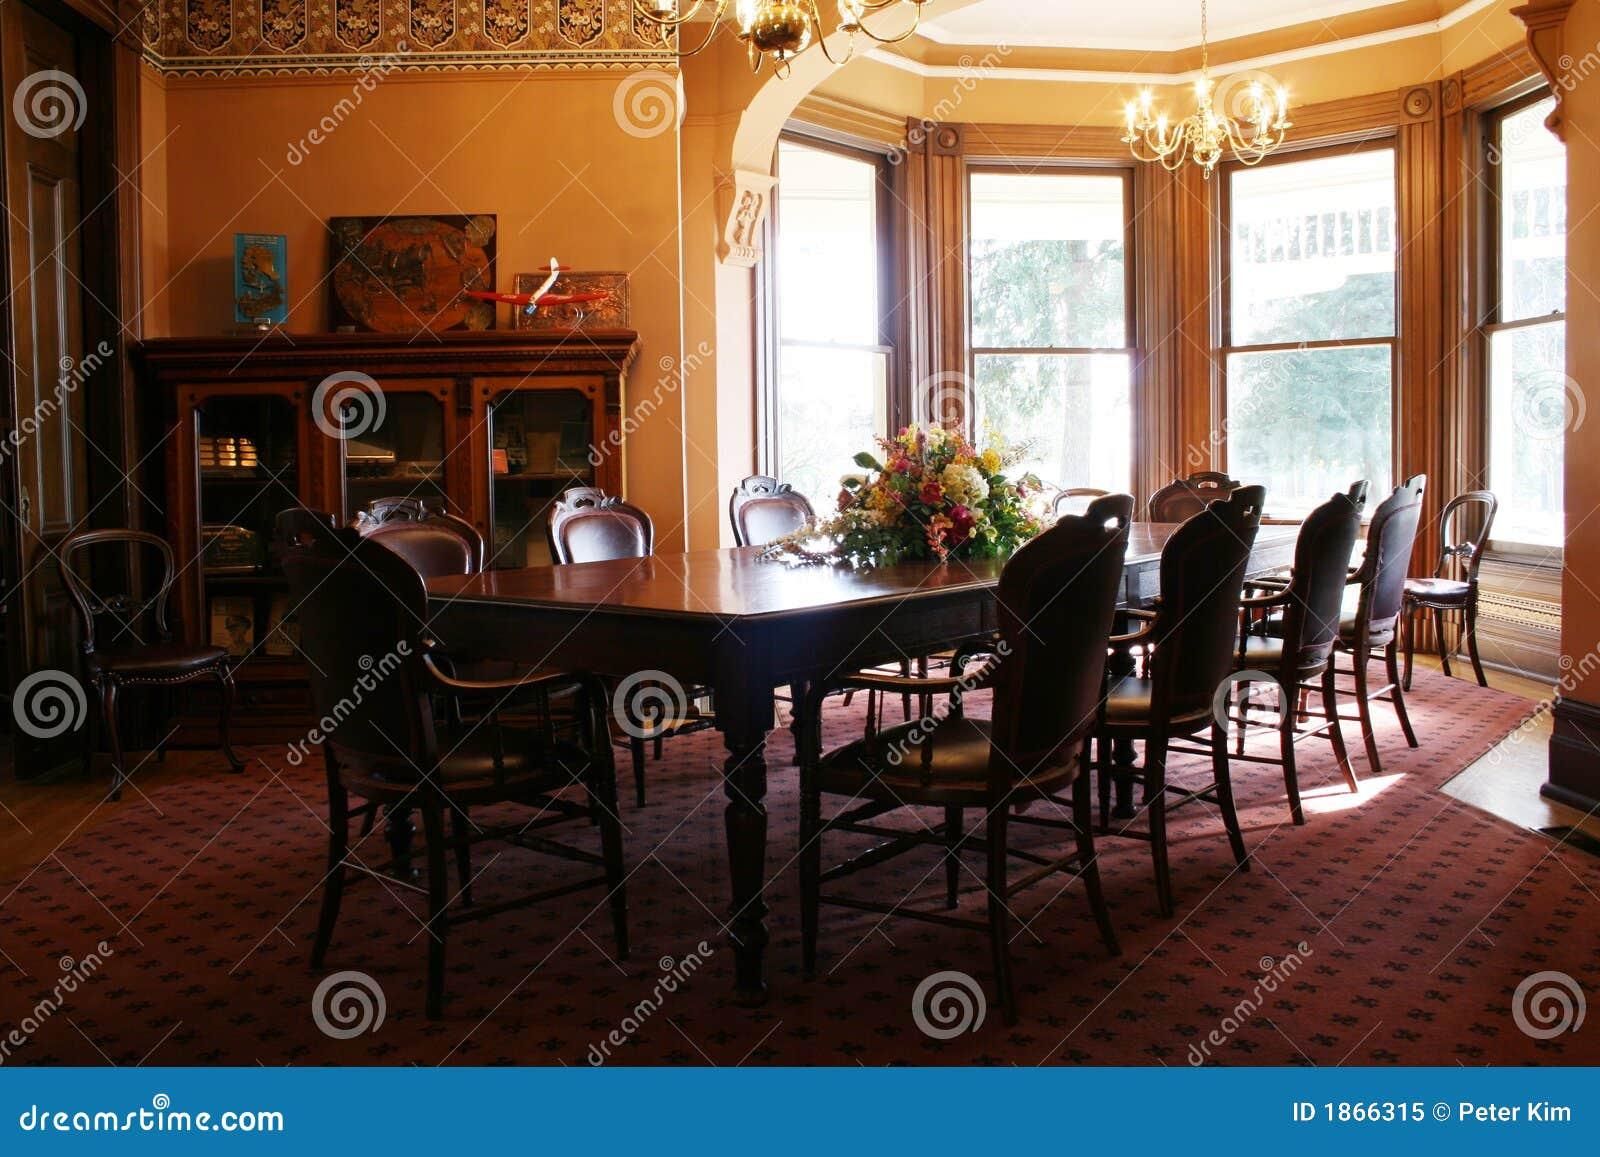 Victoriaanse eetkamer royalty vrije stock foto afbeelding 1866315 - Foto eetkamer ...